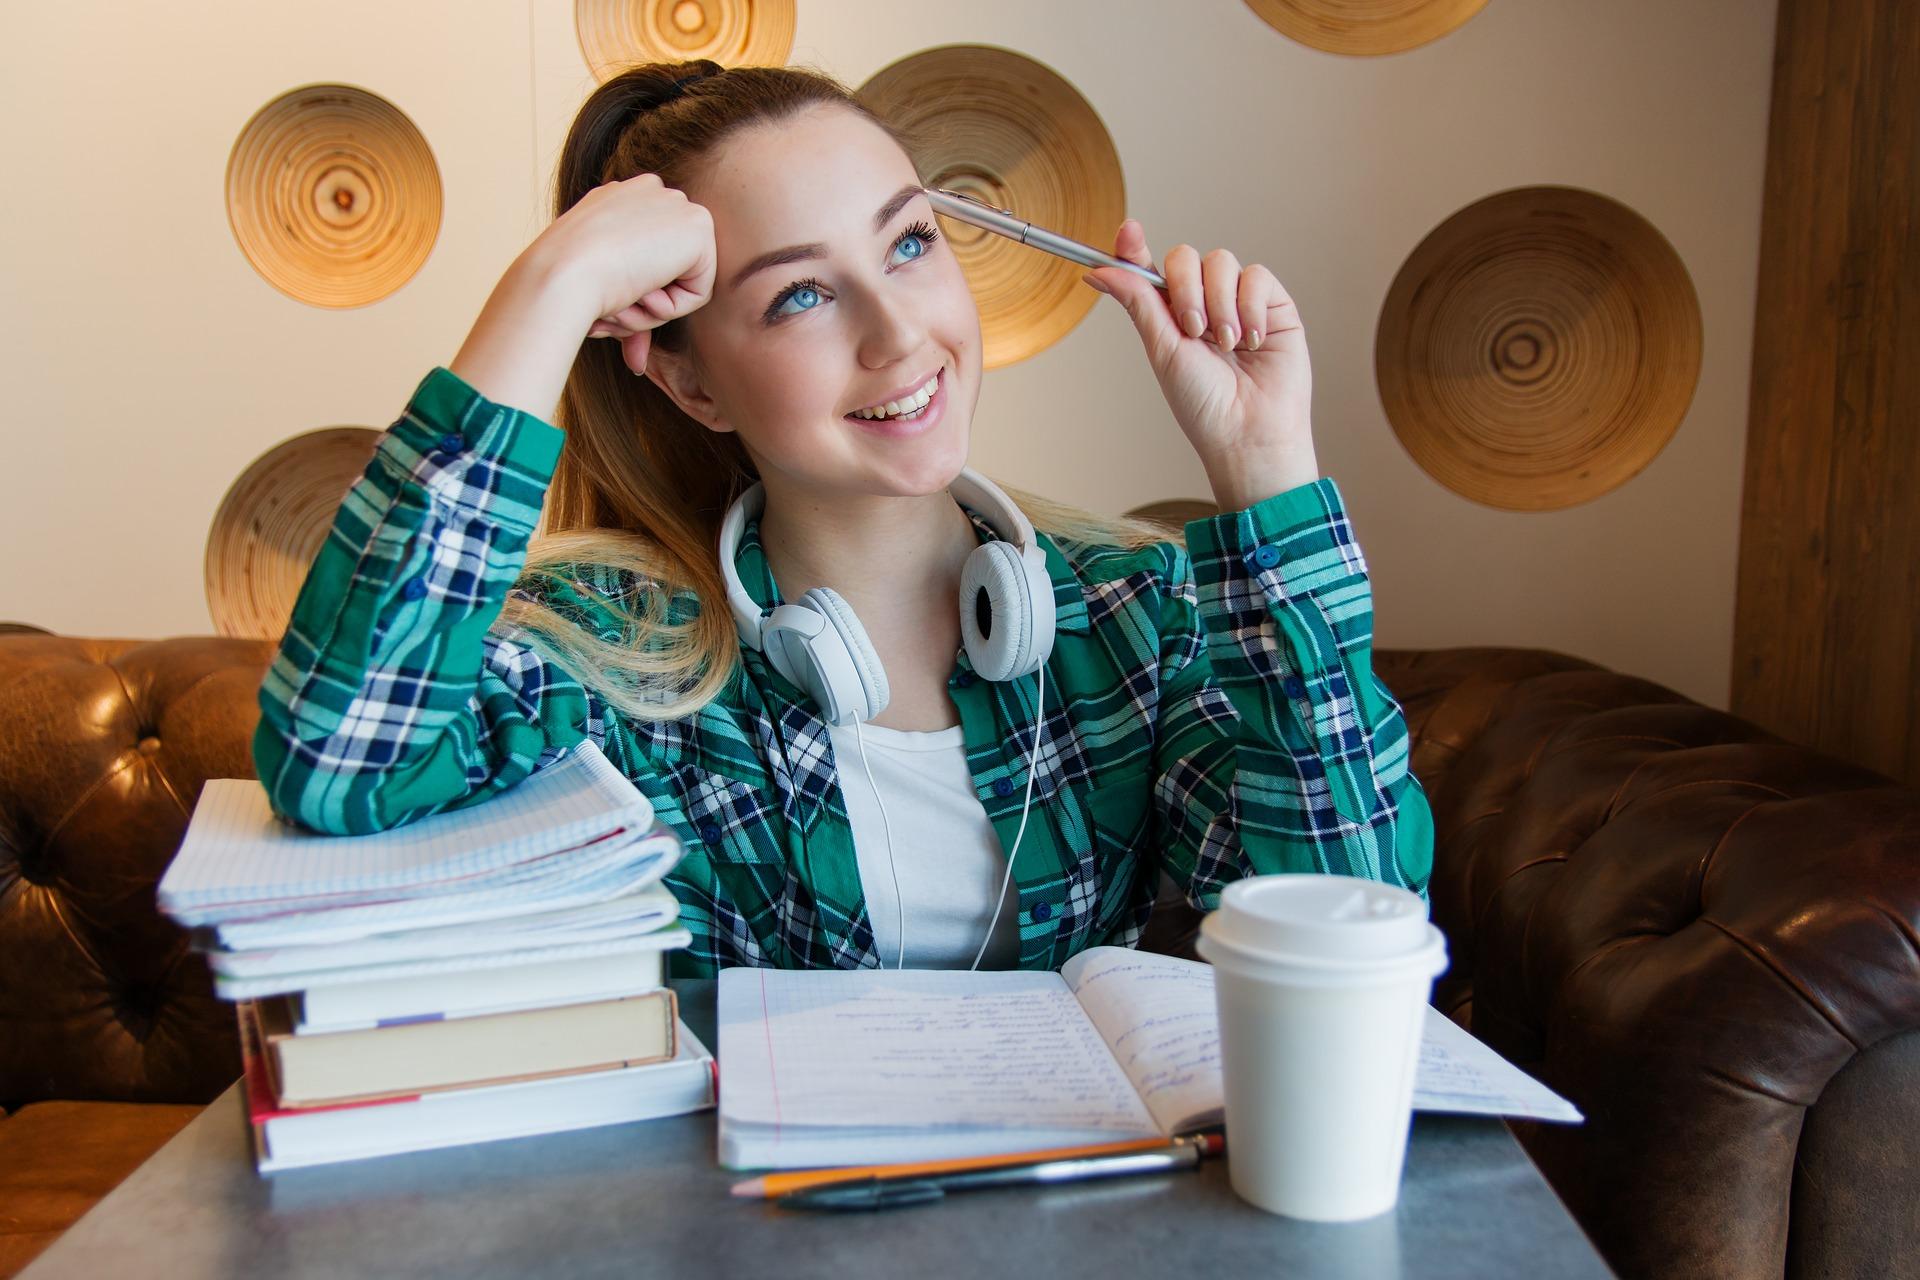 girl-young-student-sitting-table-3718521-Pixabay